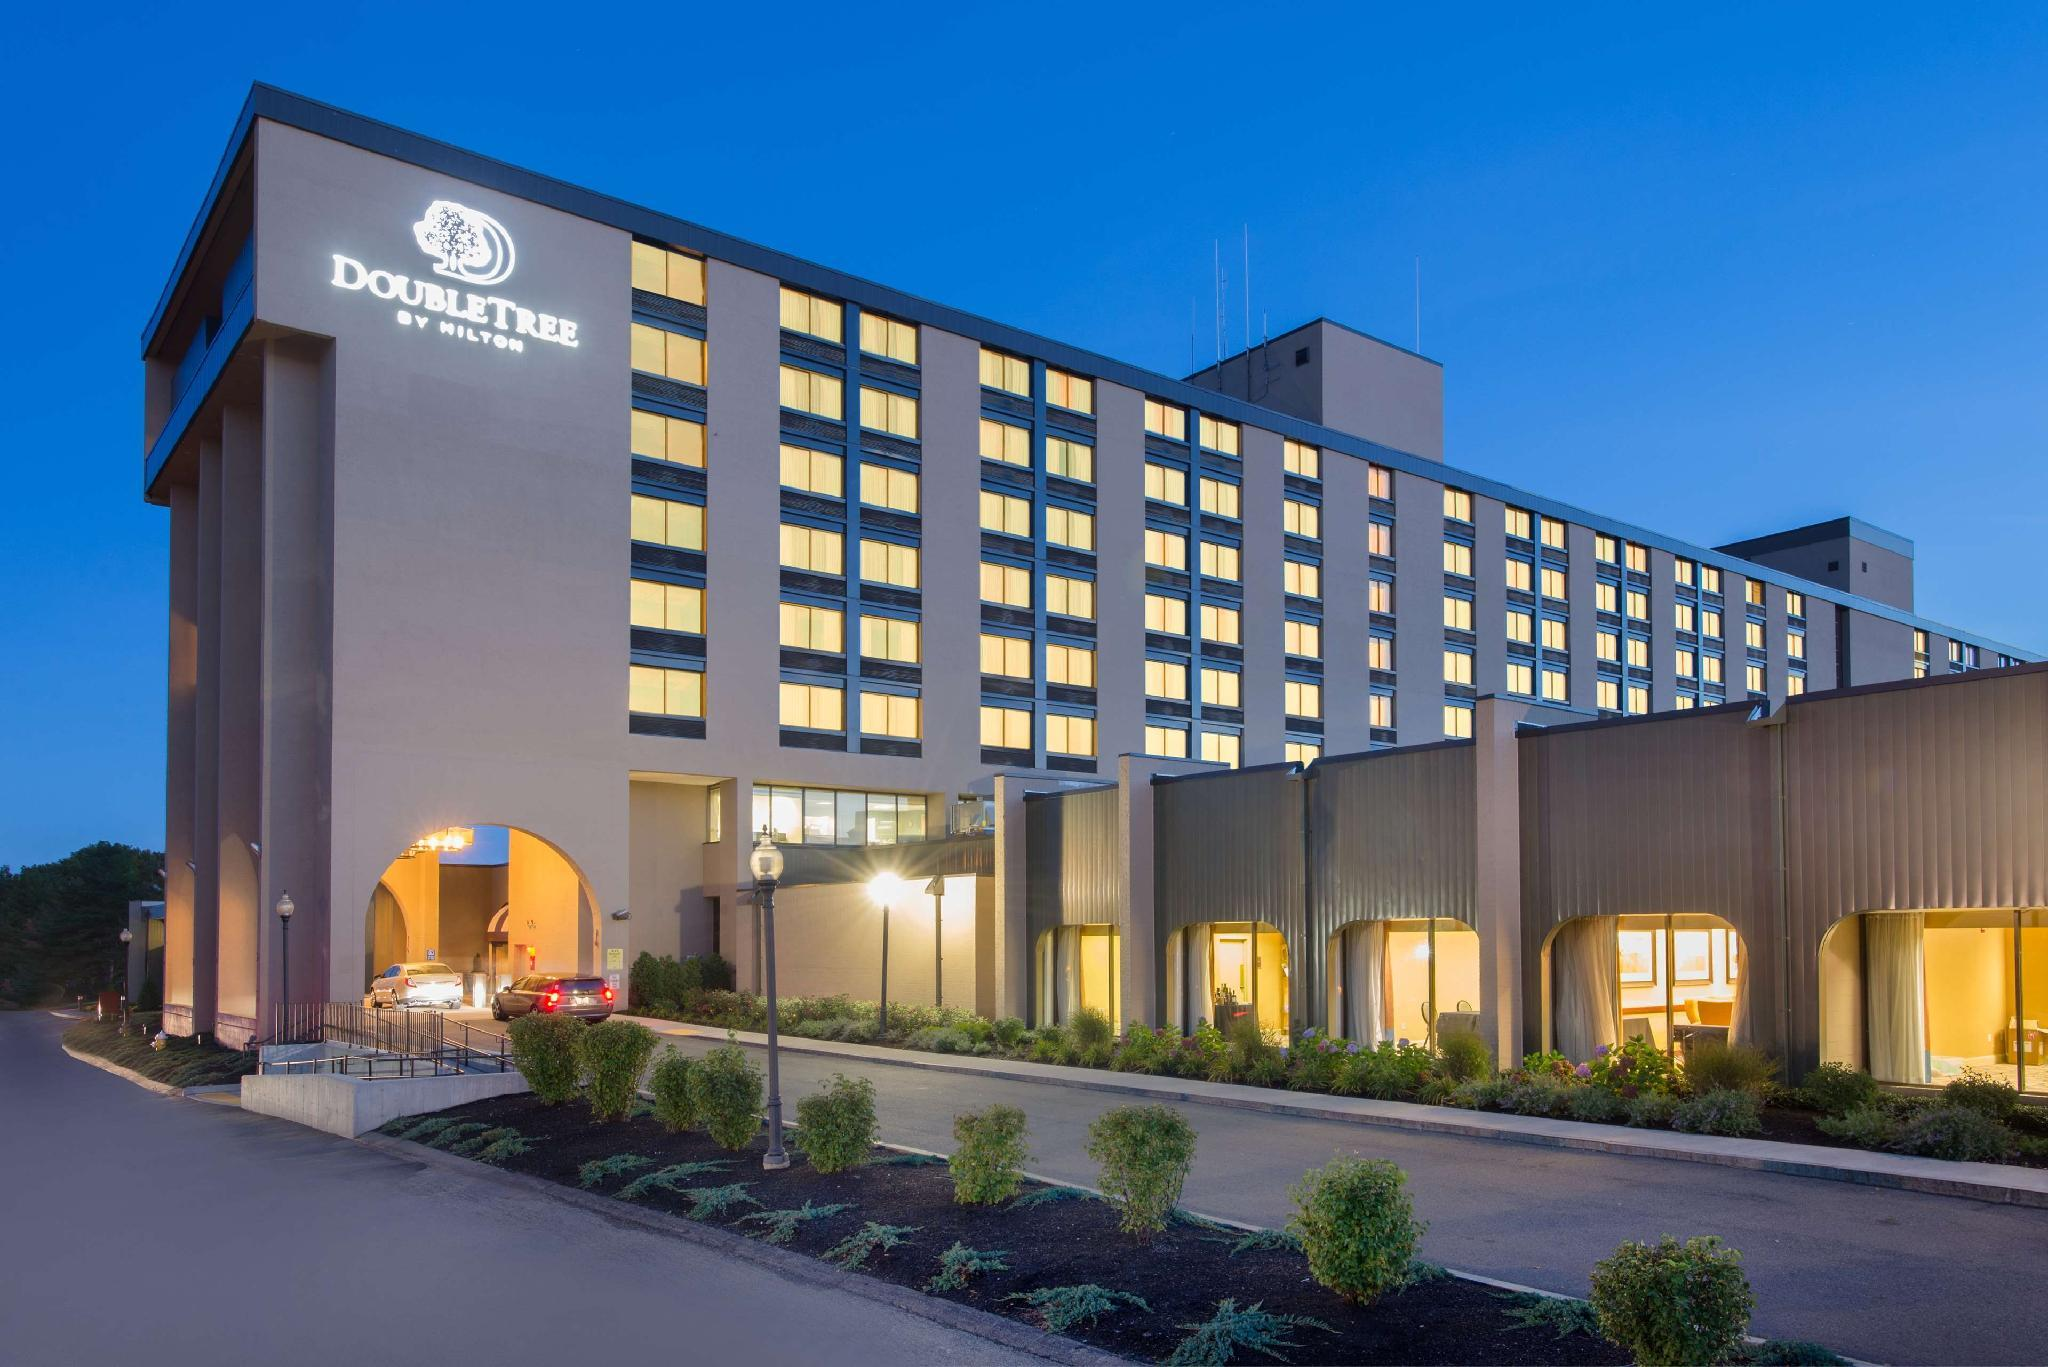 DoubleTree by Hilton Boston North Shore Hotel image